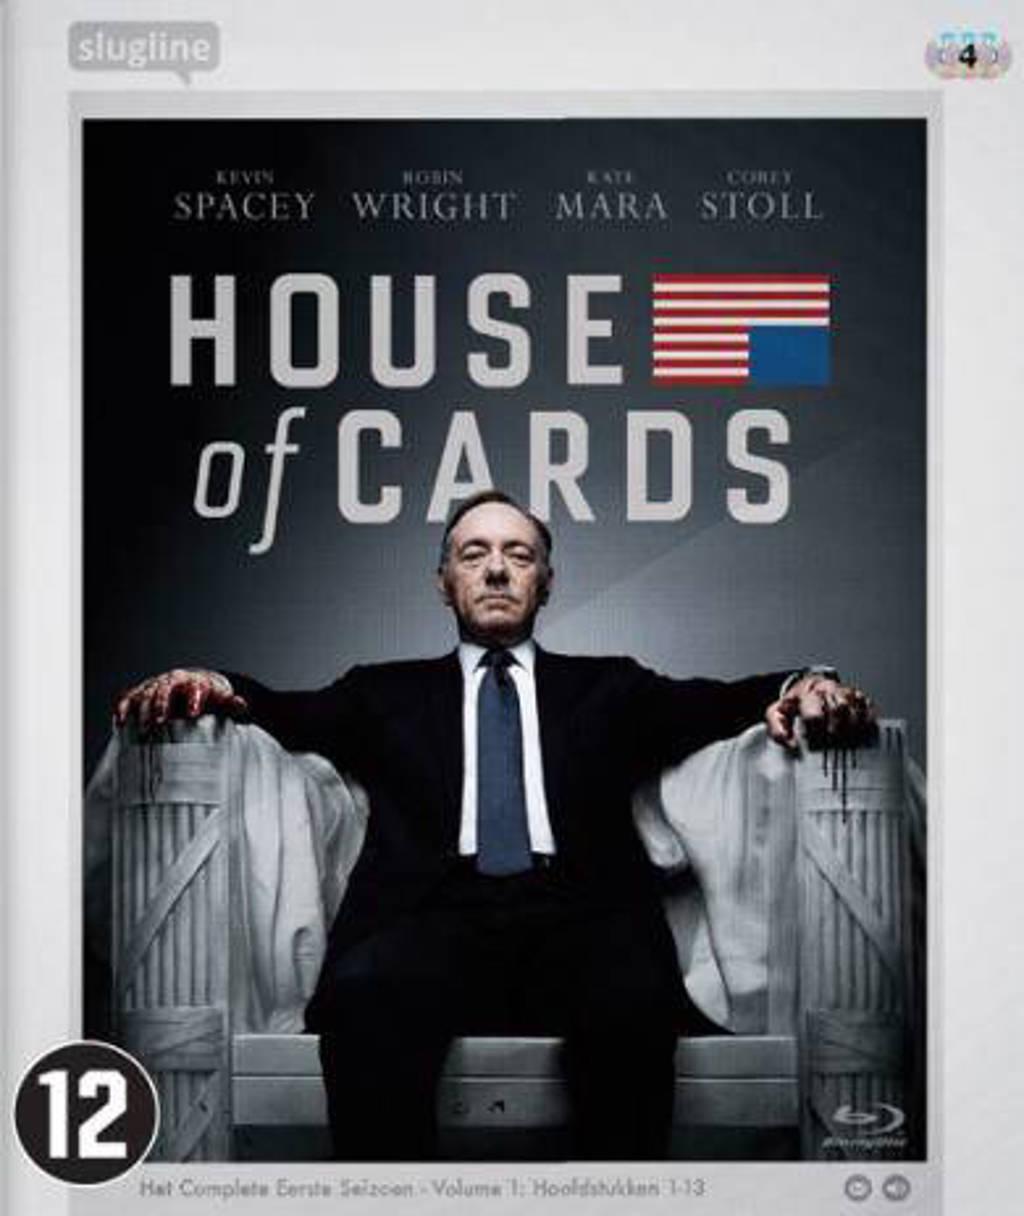 House of cards - Seizoen 1 (Blu-ray)